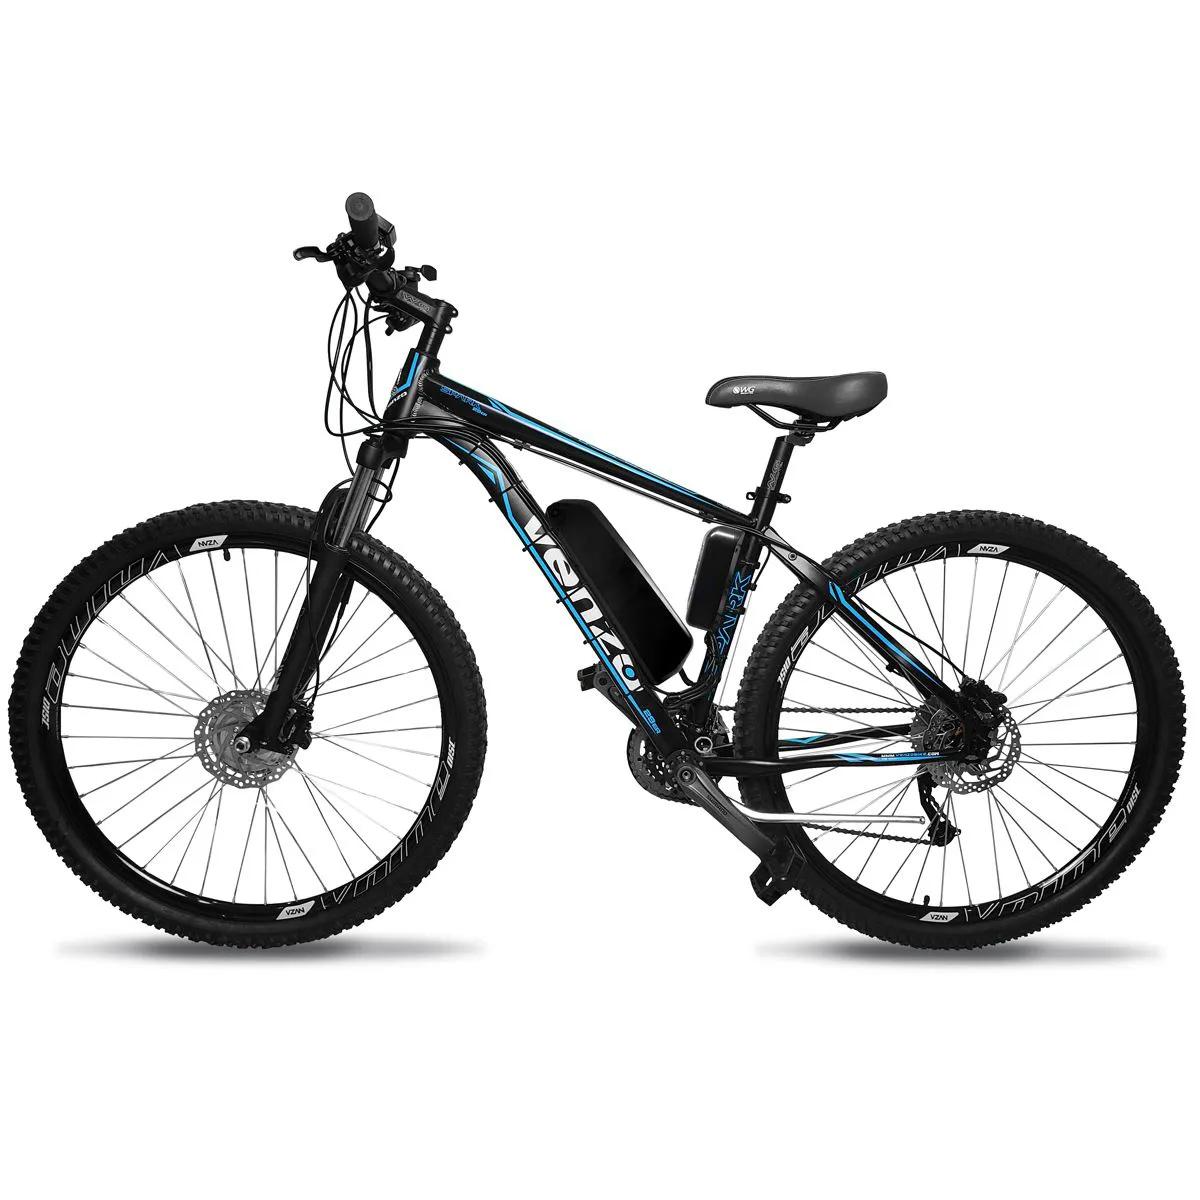 Bicicleta Elétrica Aro 29 Alumino Bateria de LÍTIO TecFalcon ALIVIO - 500 Watts